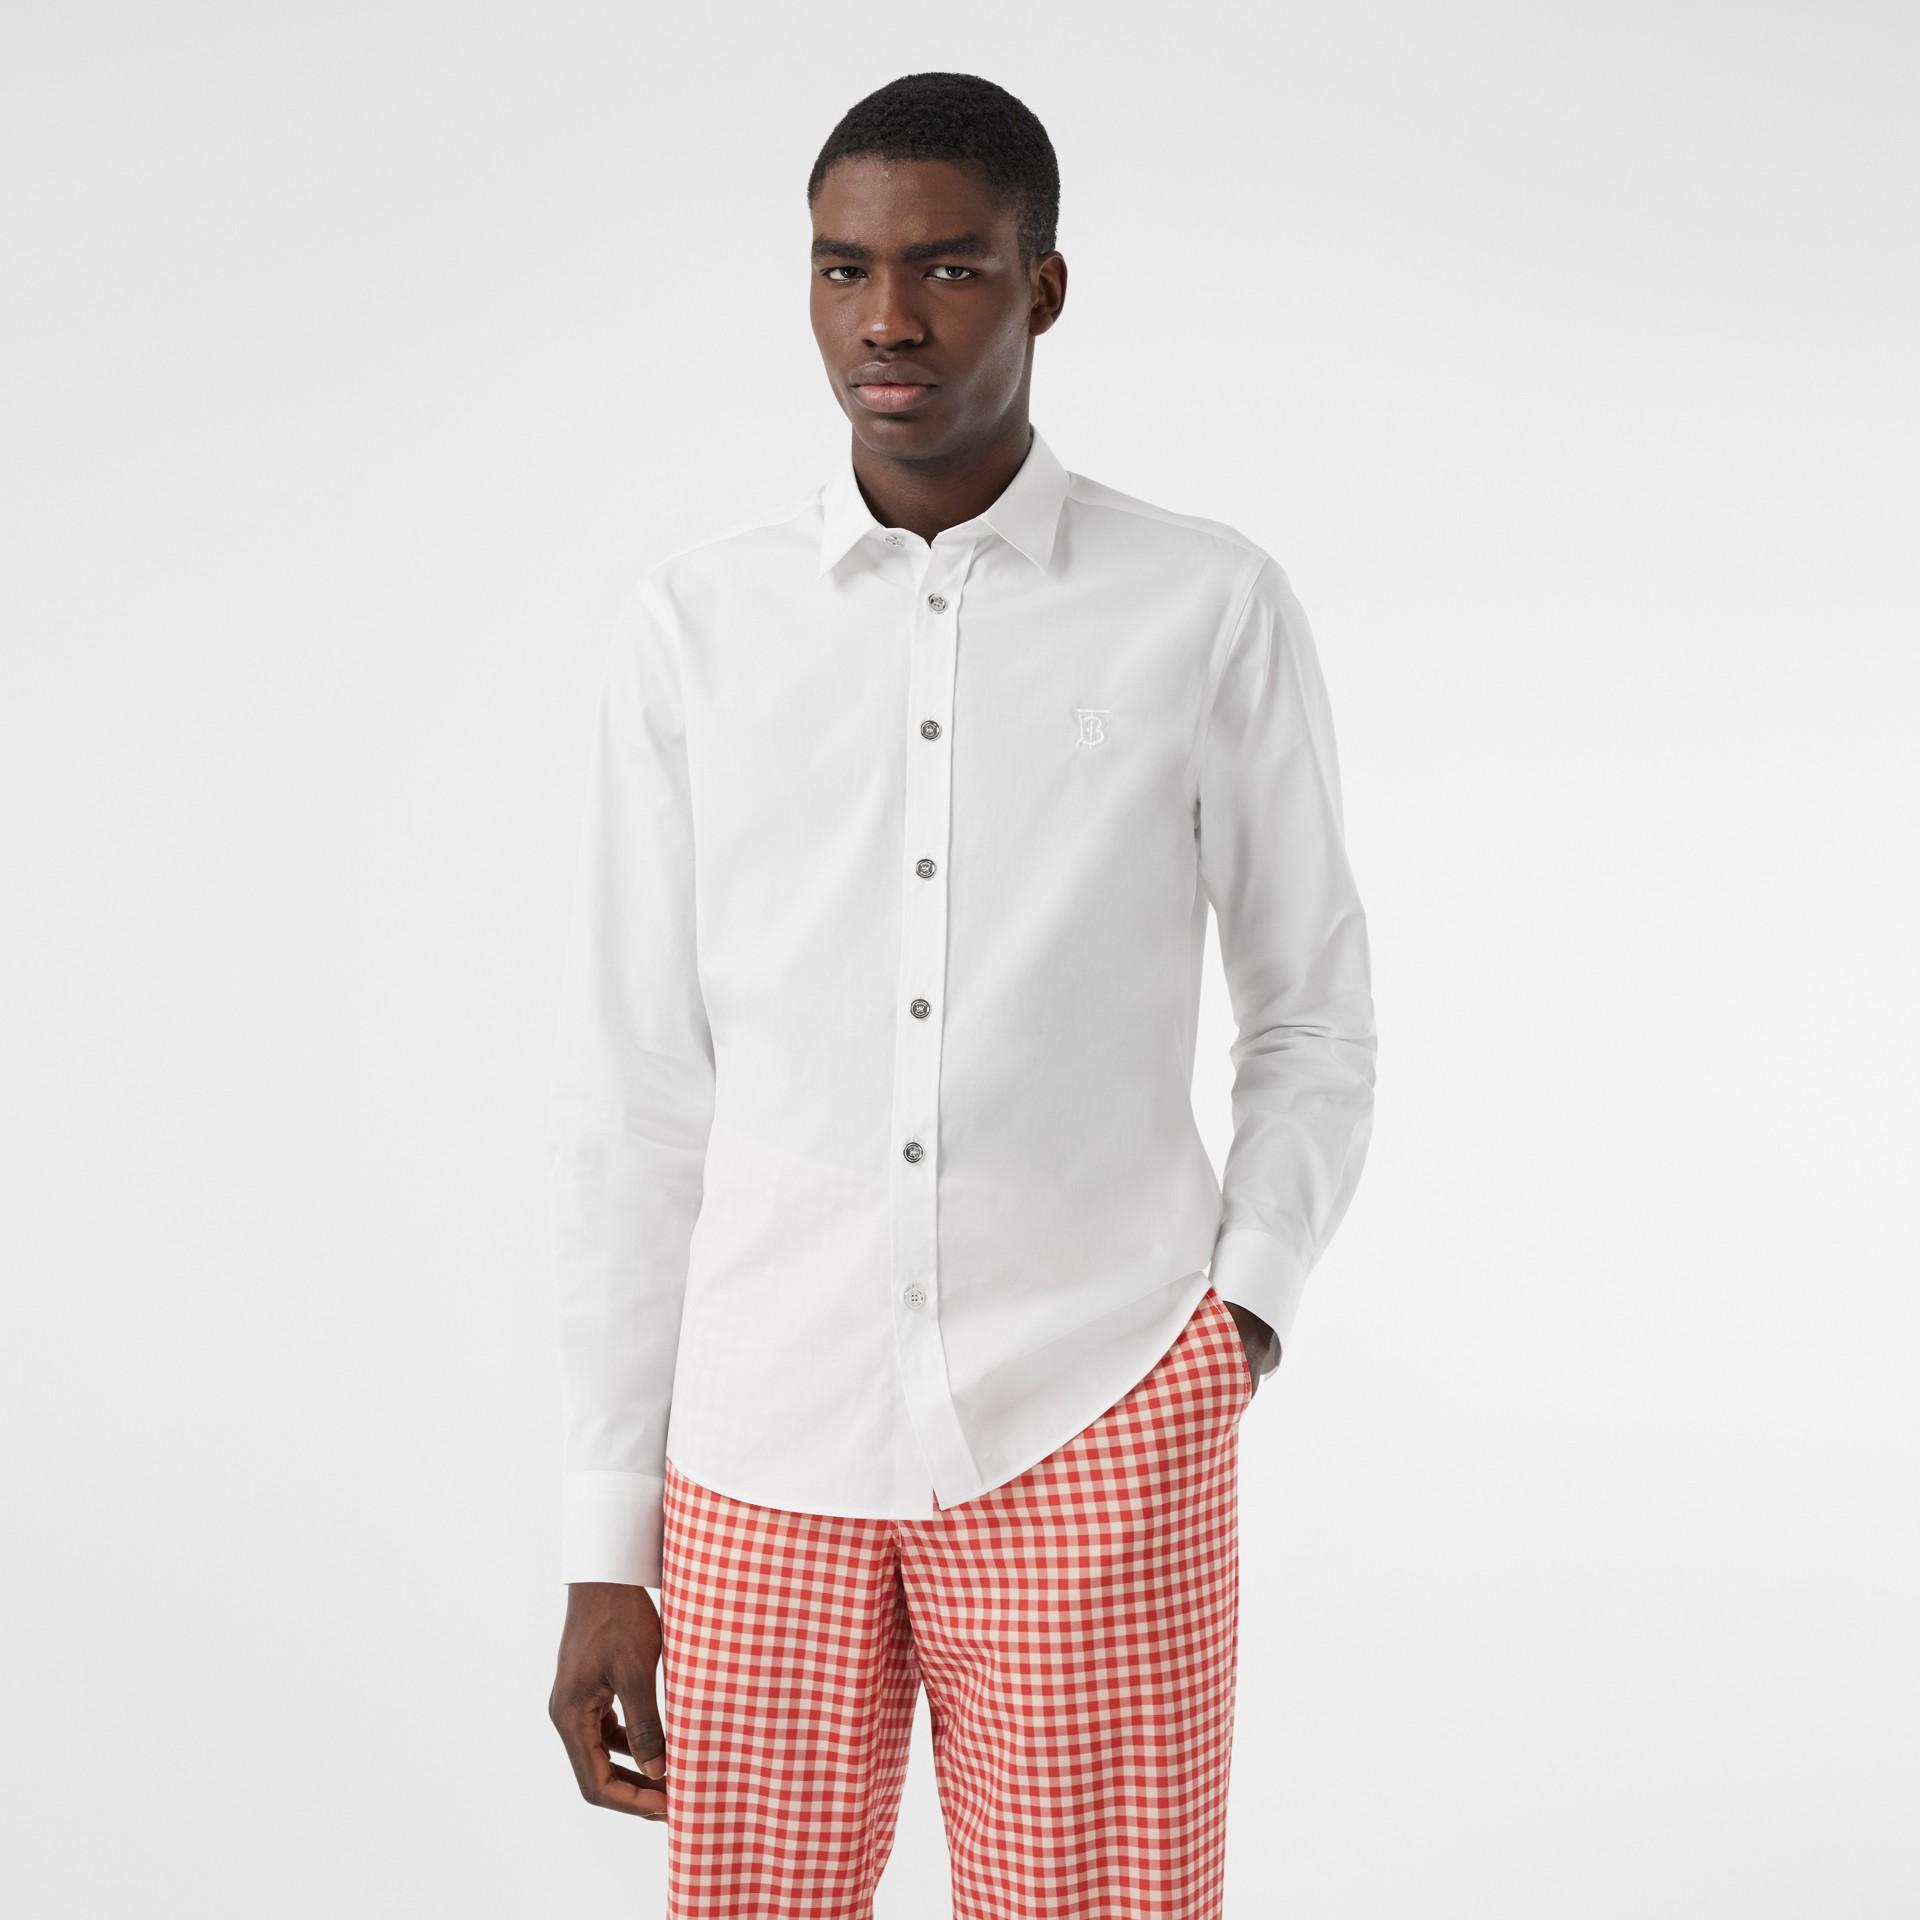 Monogram Motif Stretch Cotton Poplin Shirt in White - Men | Burberry United Kingdom - gallery image 0